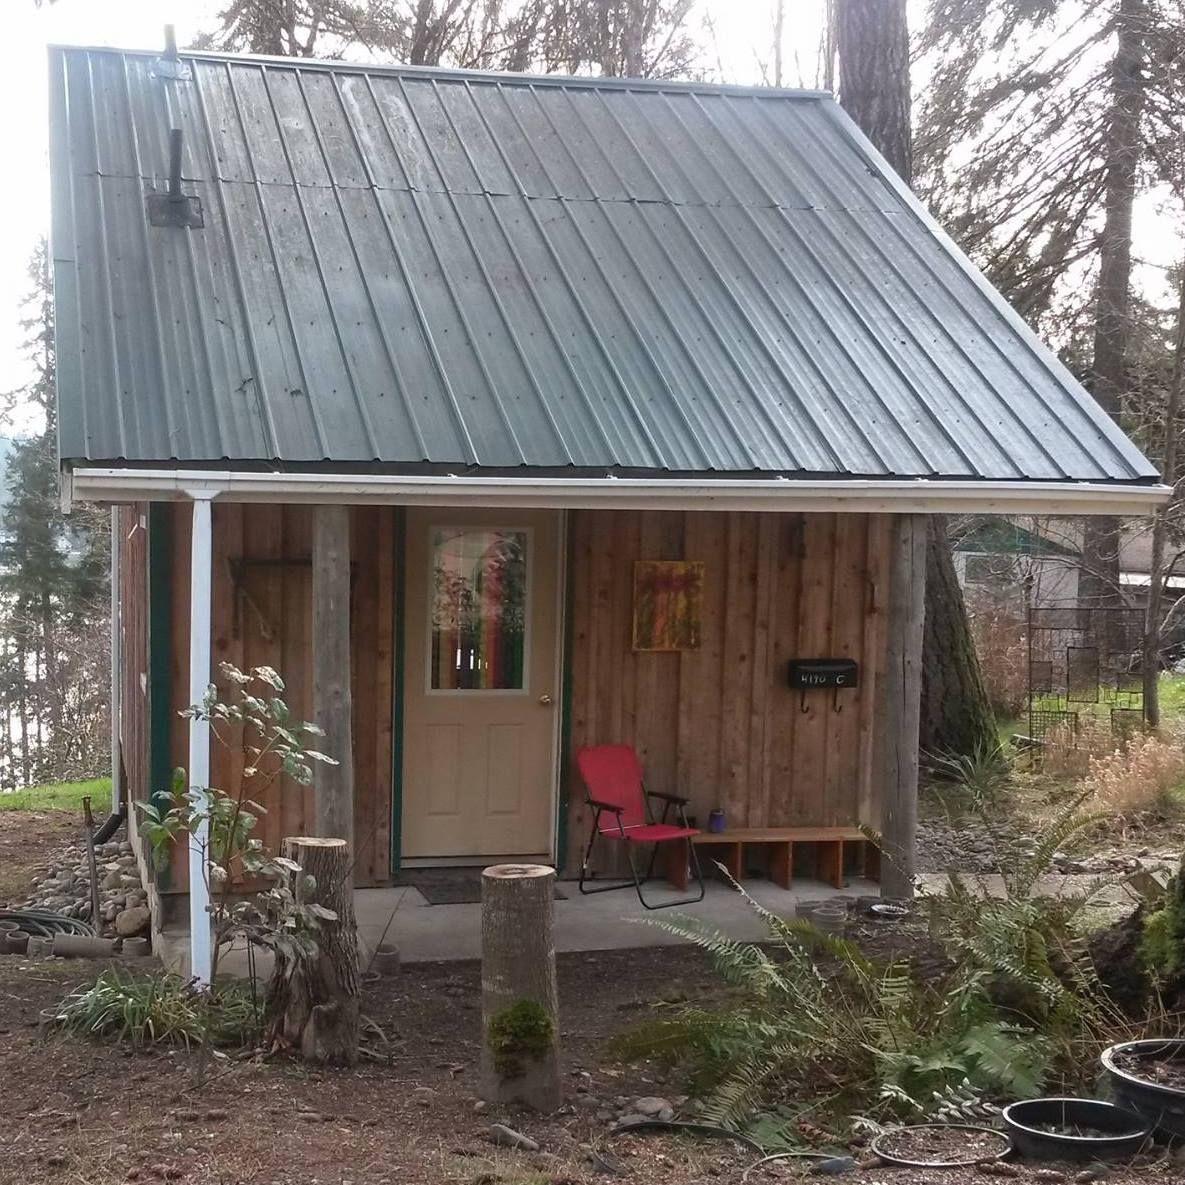 My Tiny House On Hammersley Inlet Shelton Wa Approx 350 Sq Ft Tiny House Outdoor Decor Micro House